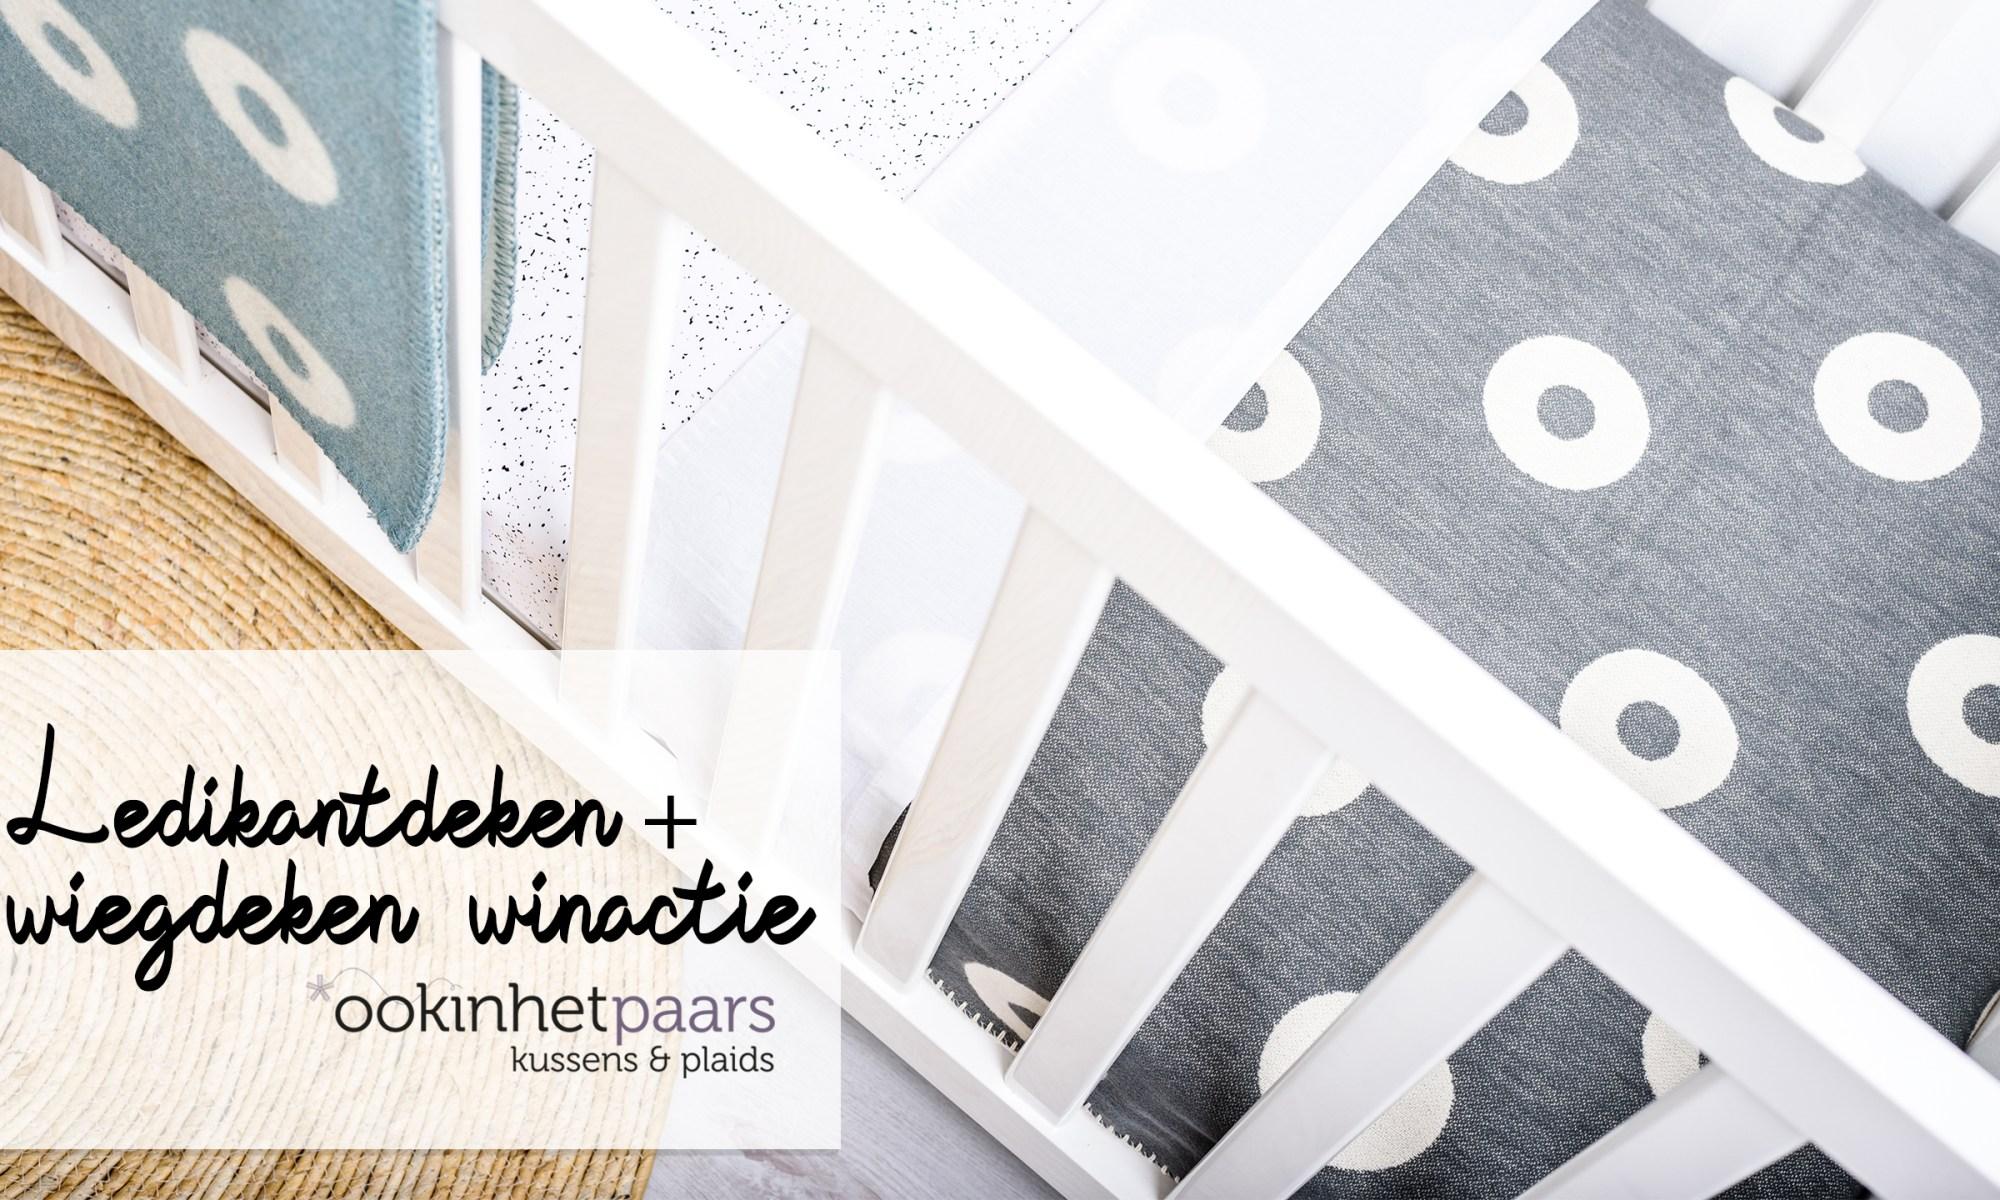 Ook in het paars ledikantdeken klippan wiegdeken review mama blog www.liefkleinwonder.nl fotograaf zwangerschap